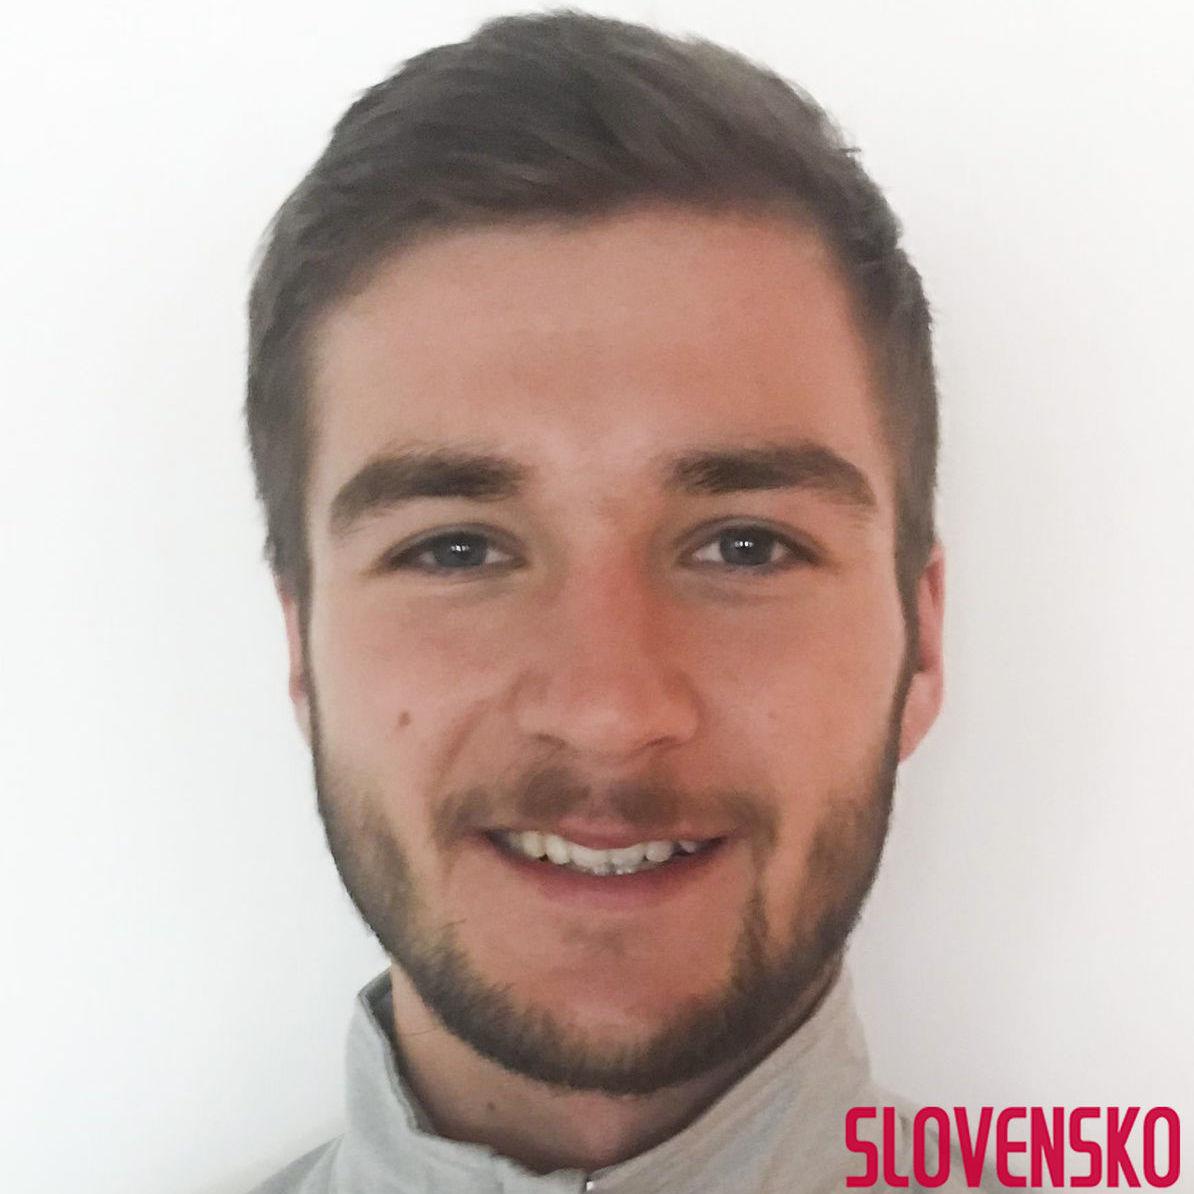 Šimon Bartko